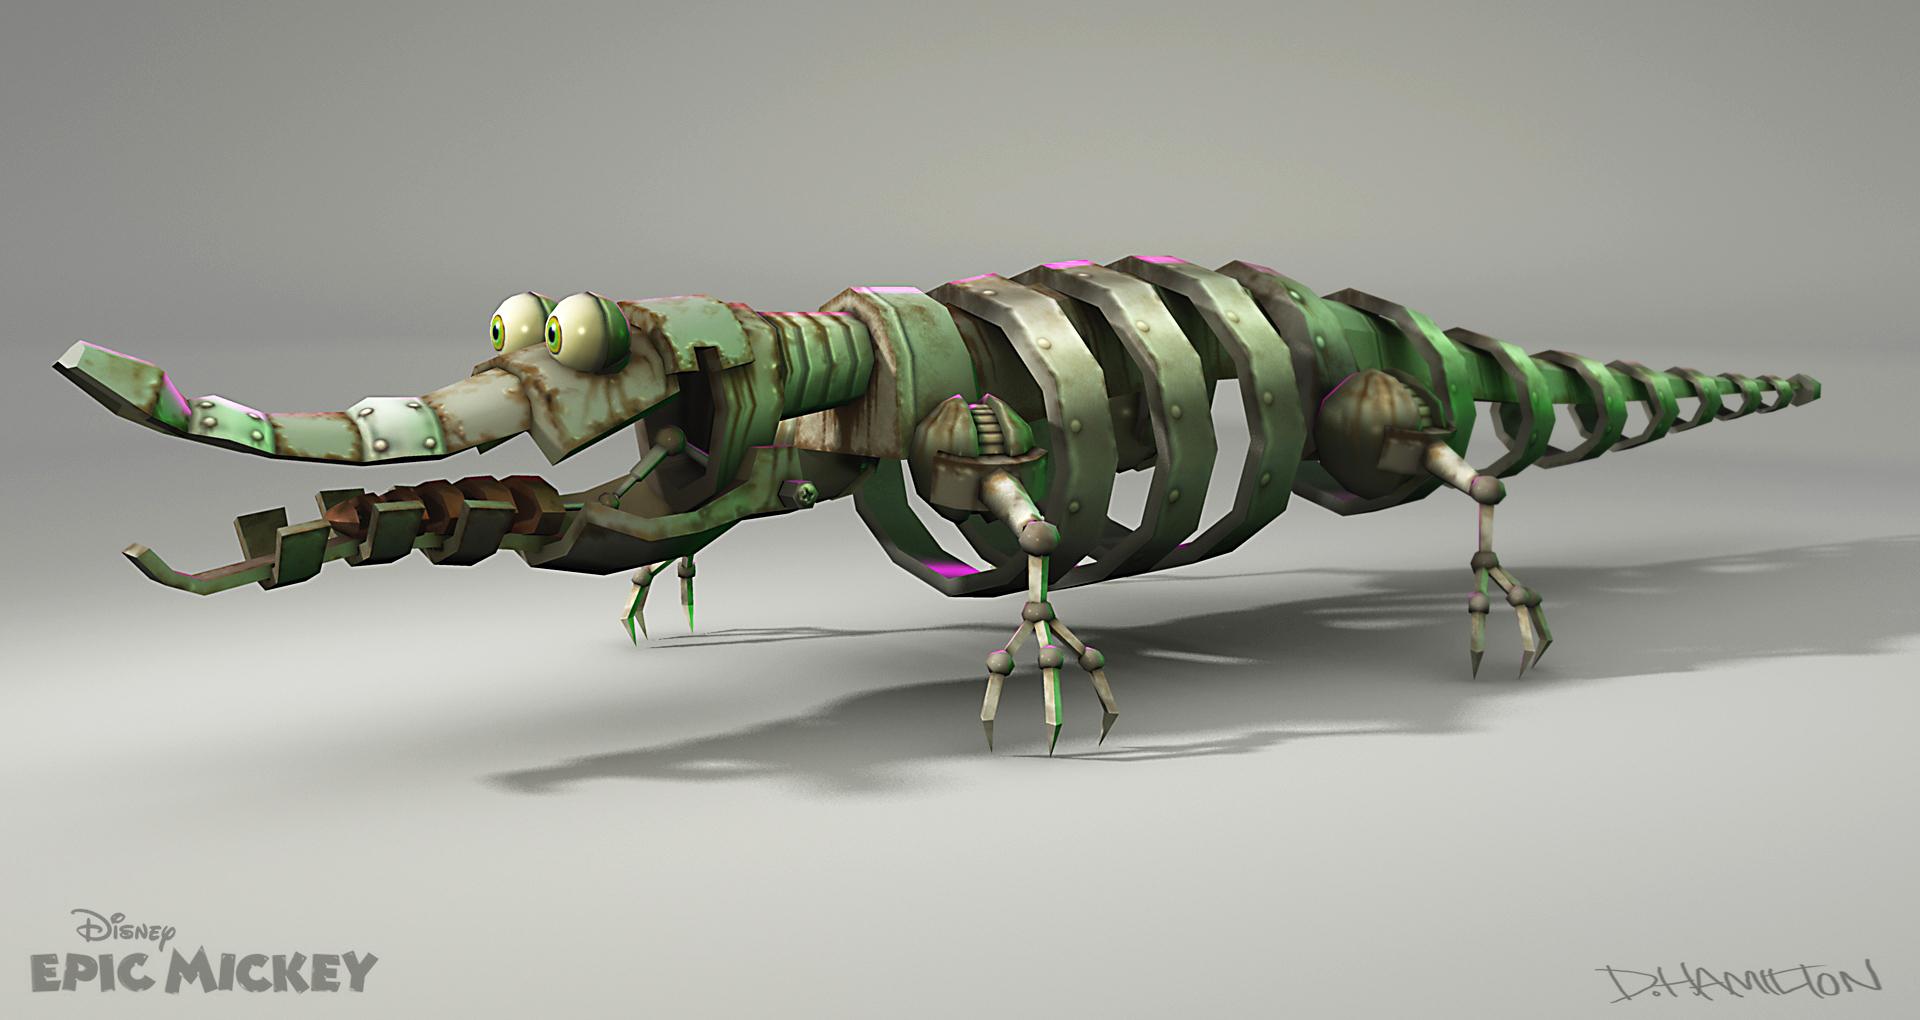 Animatronic Tick-Tock the Crocodile